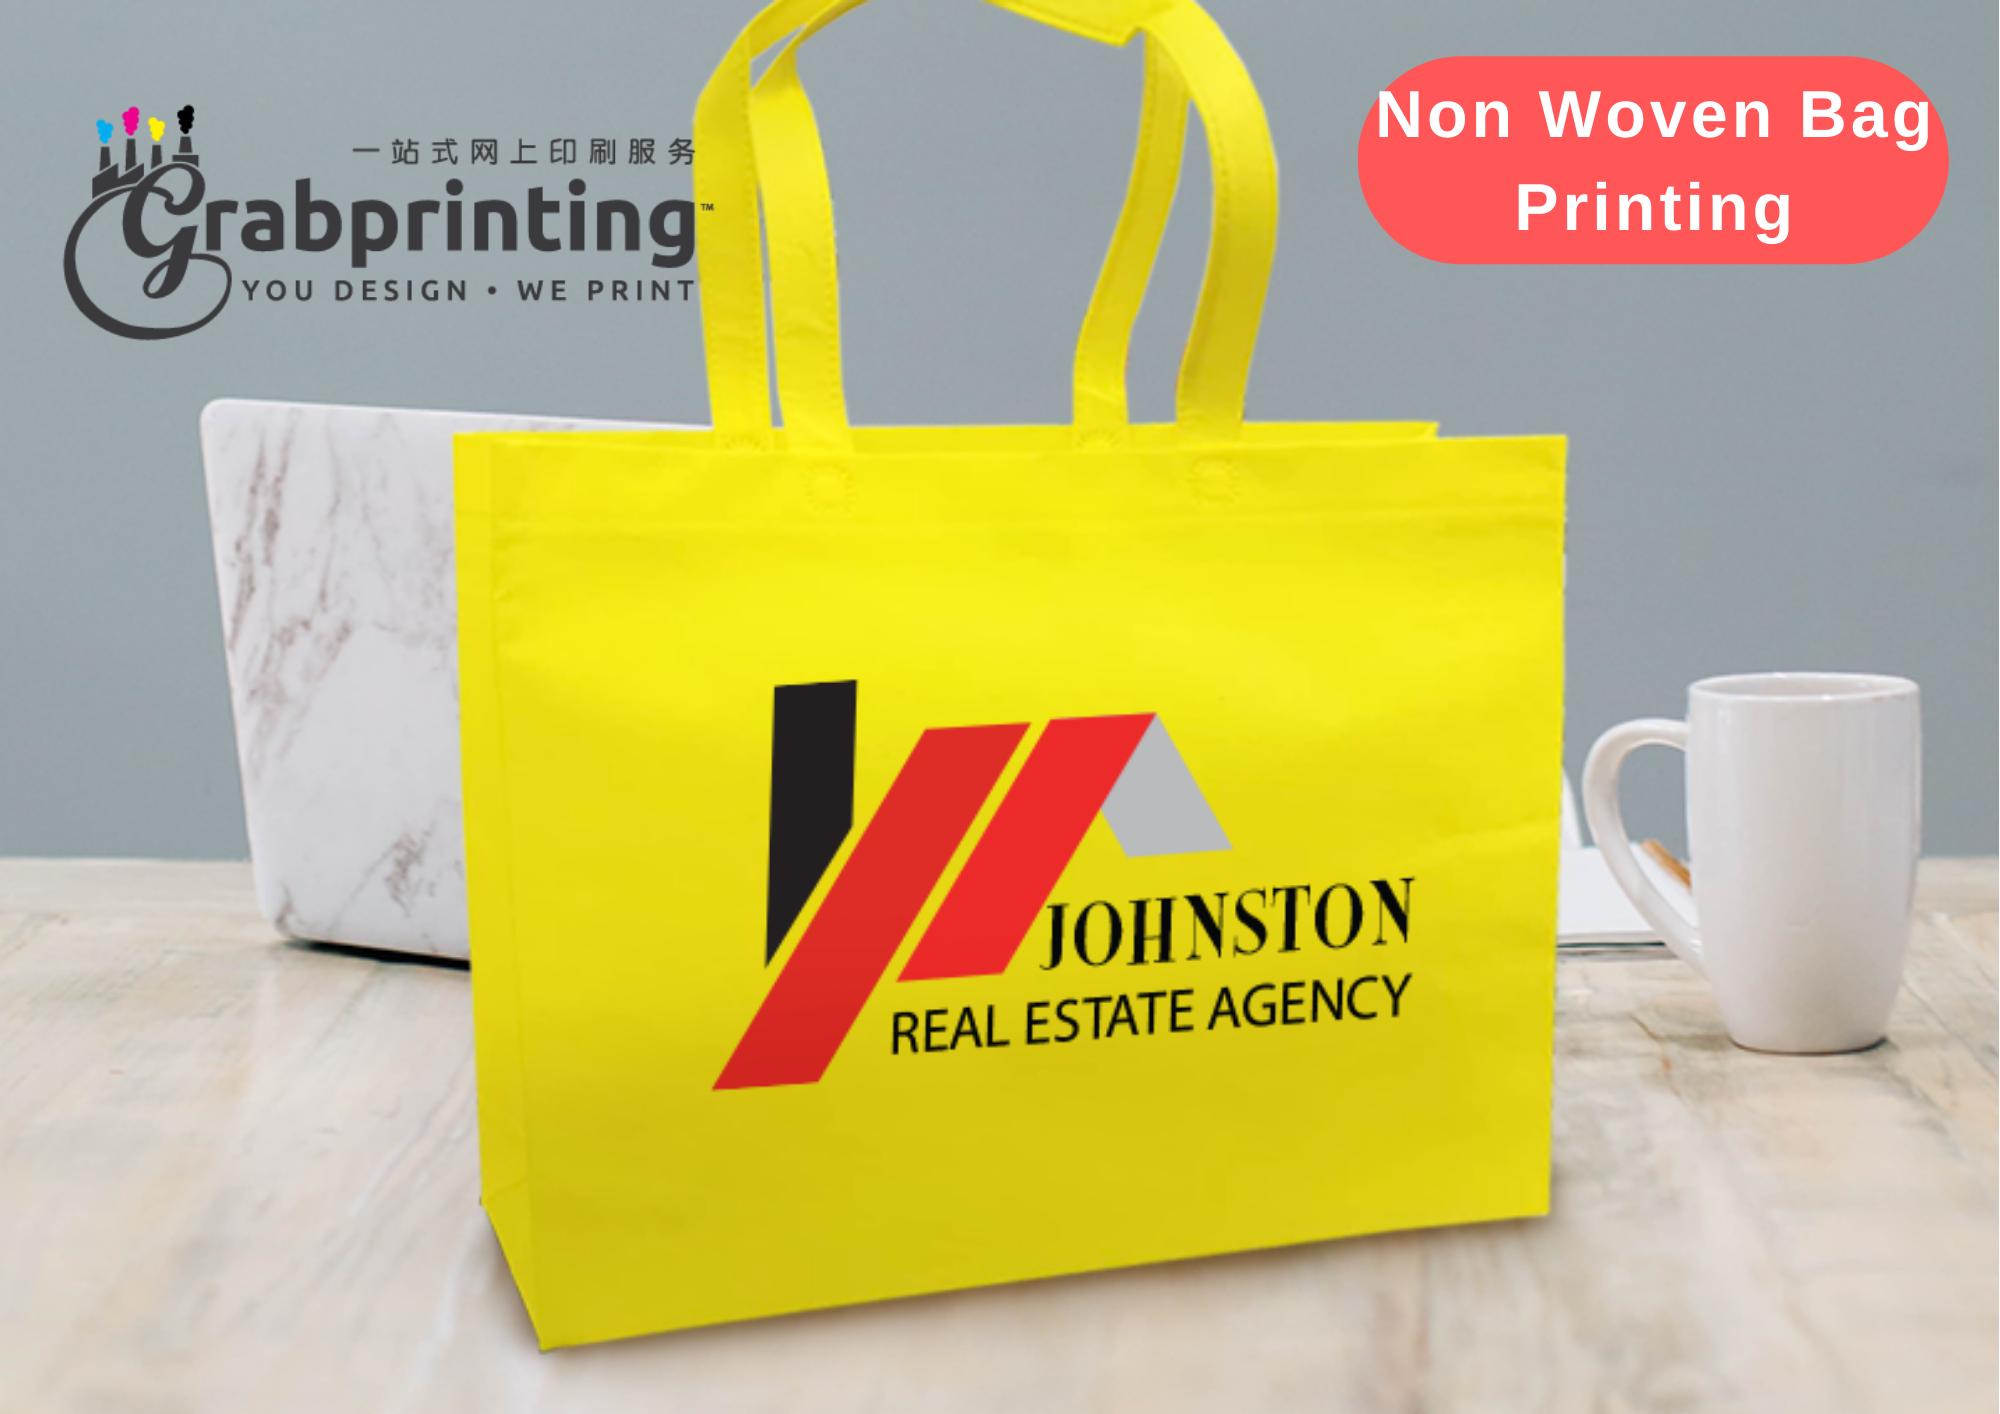 Non Woven Bag Printing Non woven bag printing 1